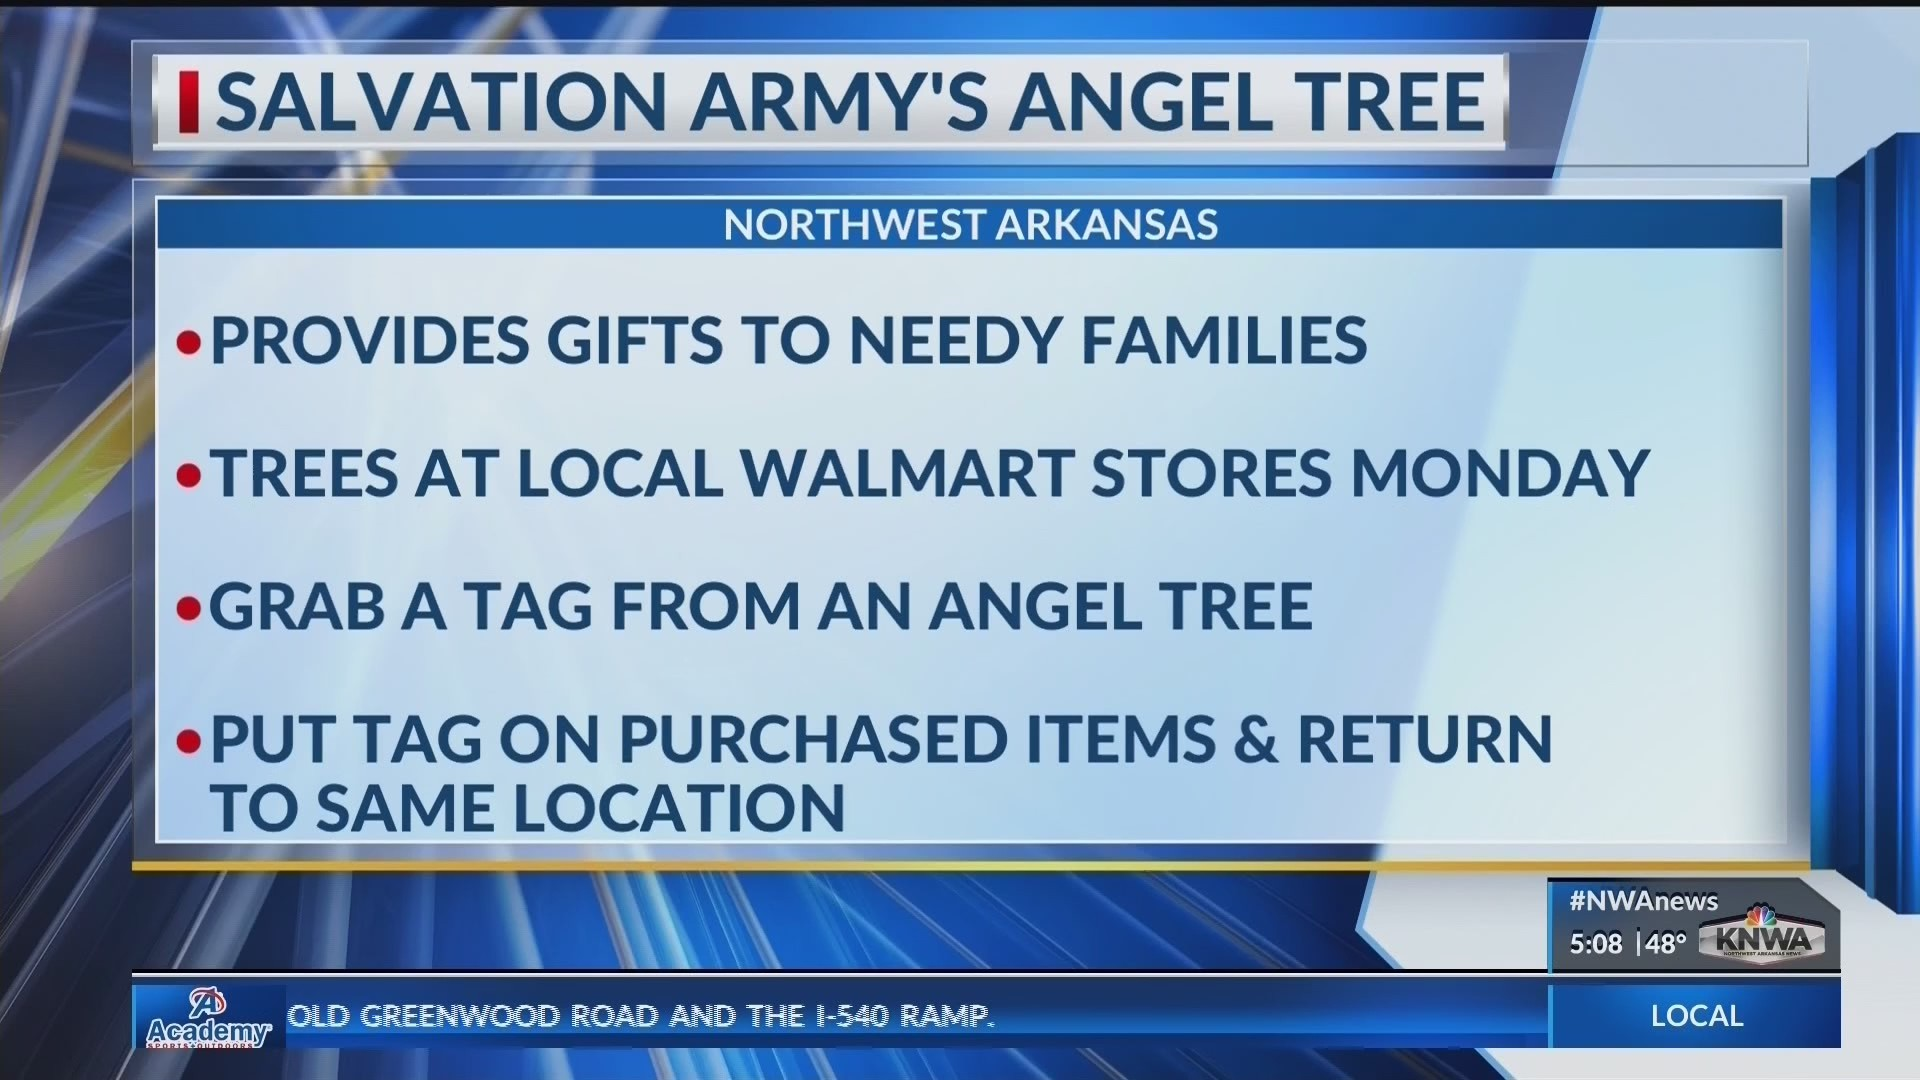 Salvation_Army_s_Angel_Tree_Program_Begi_0_20181104232418